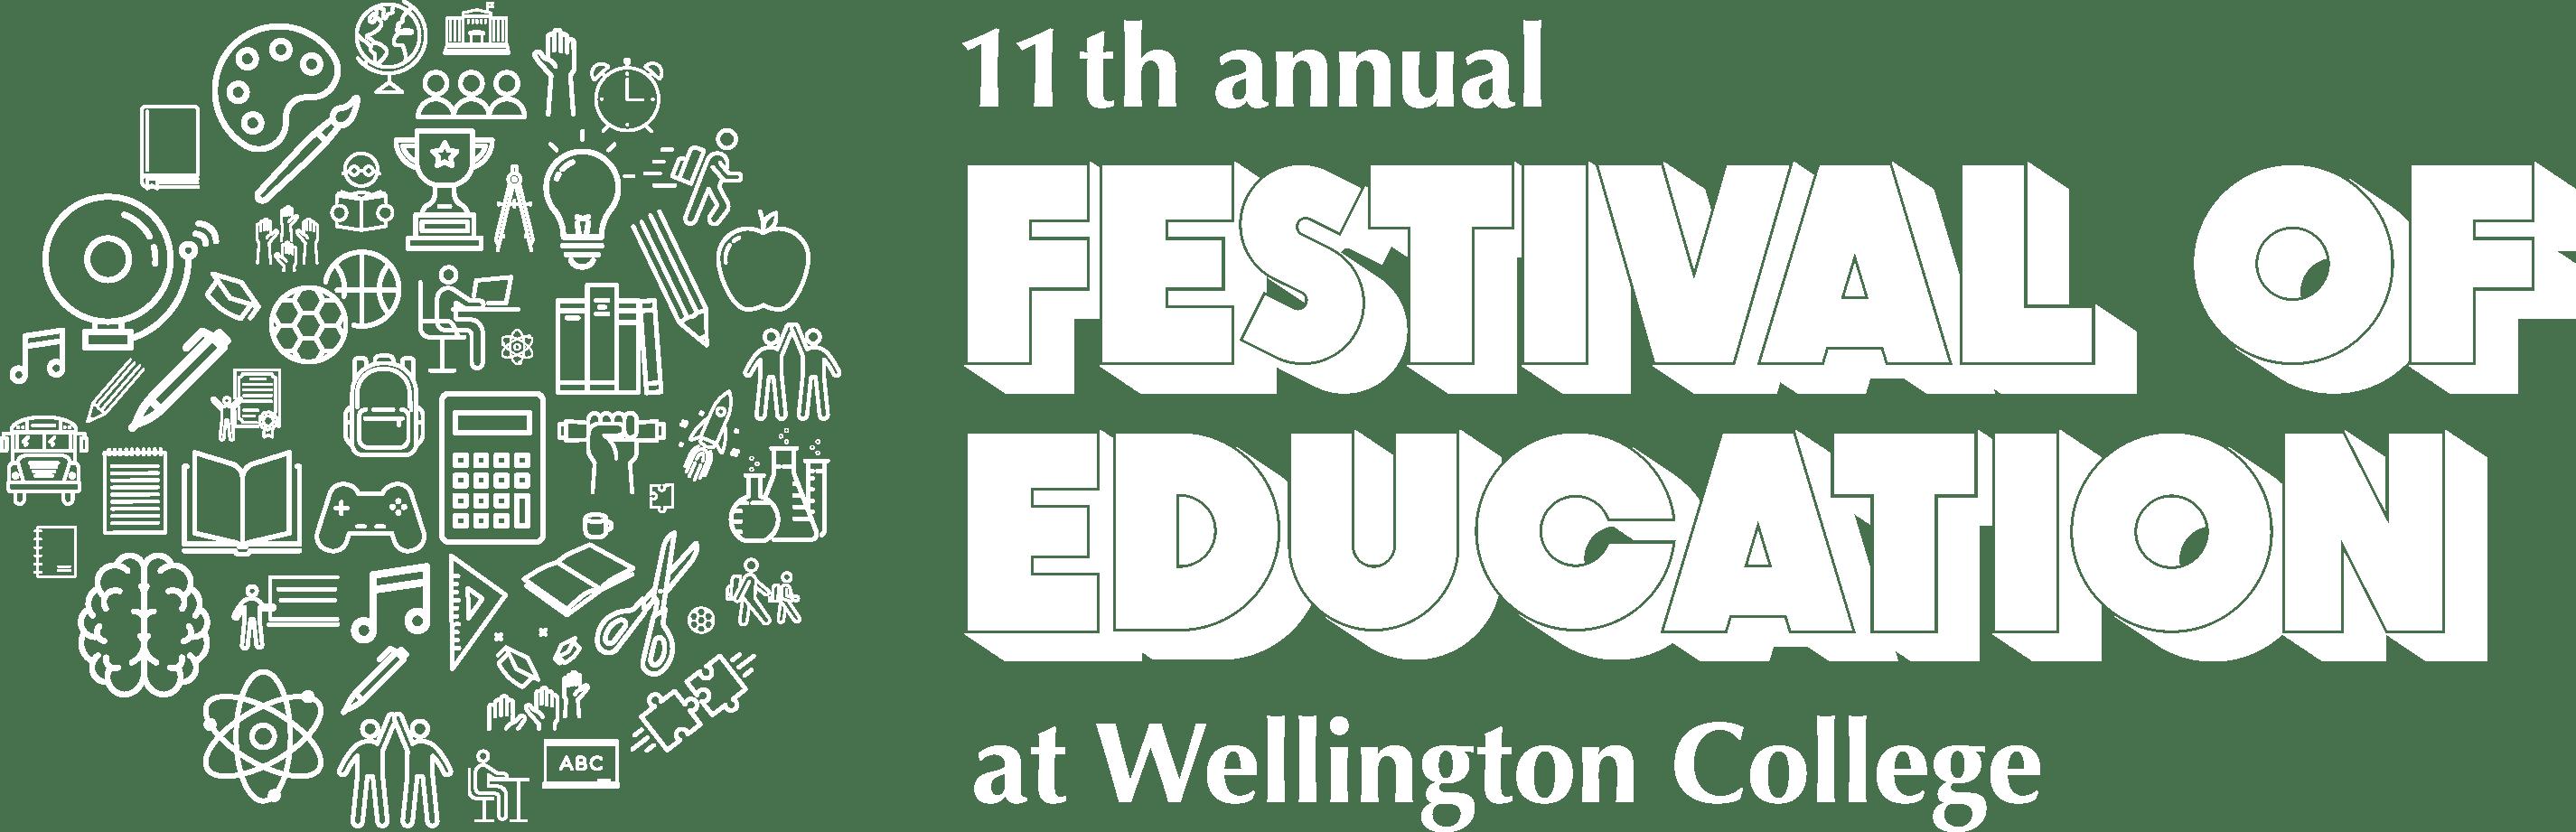 11th Festival of Education